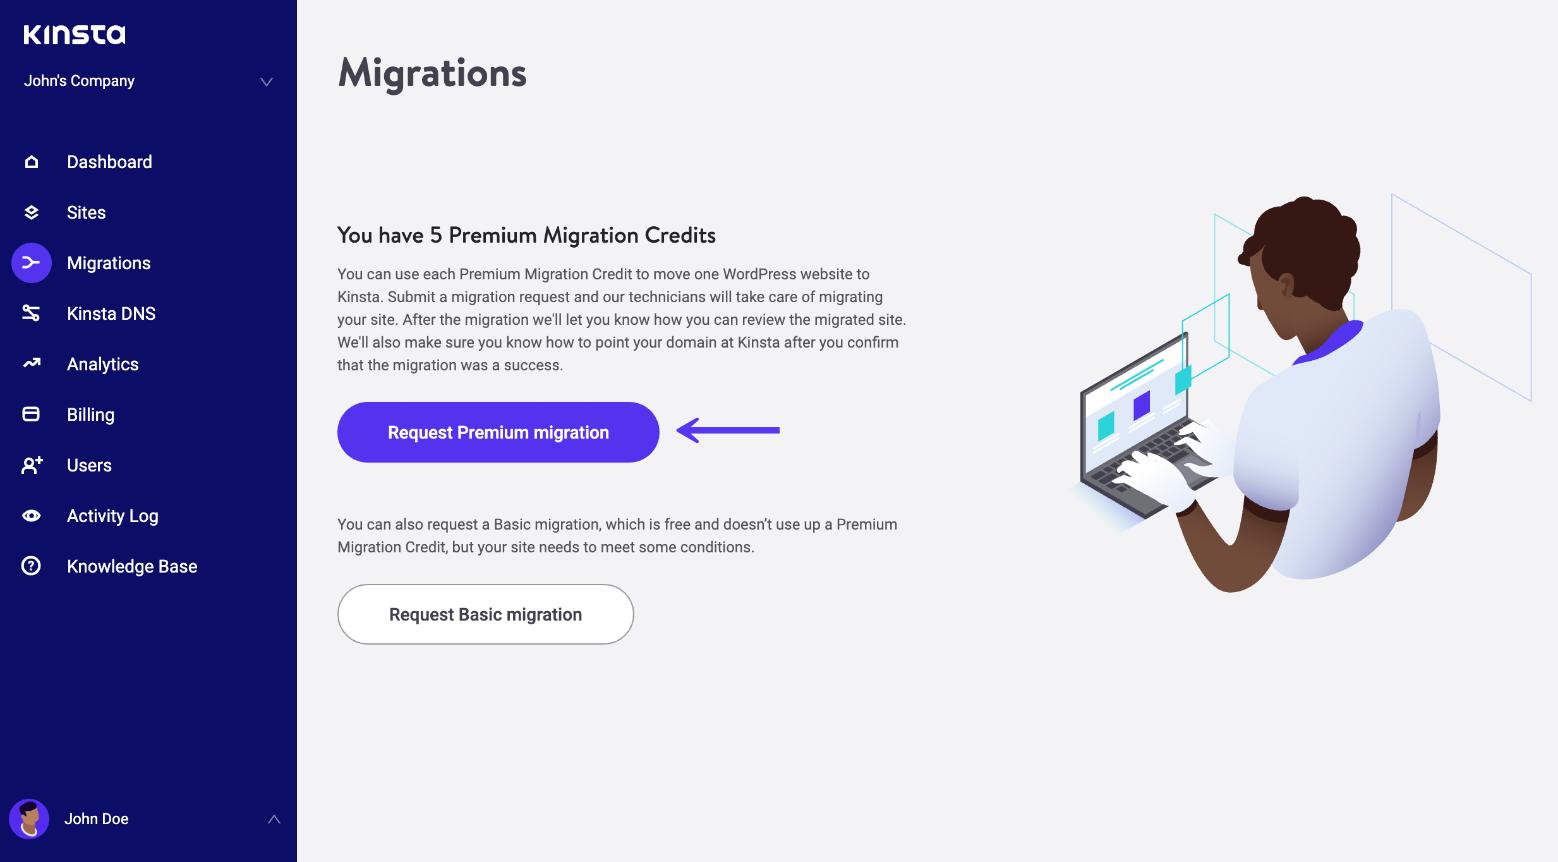 Richiedere una migrazione premium di WordPress